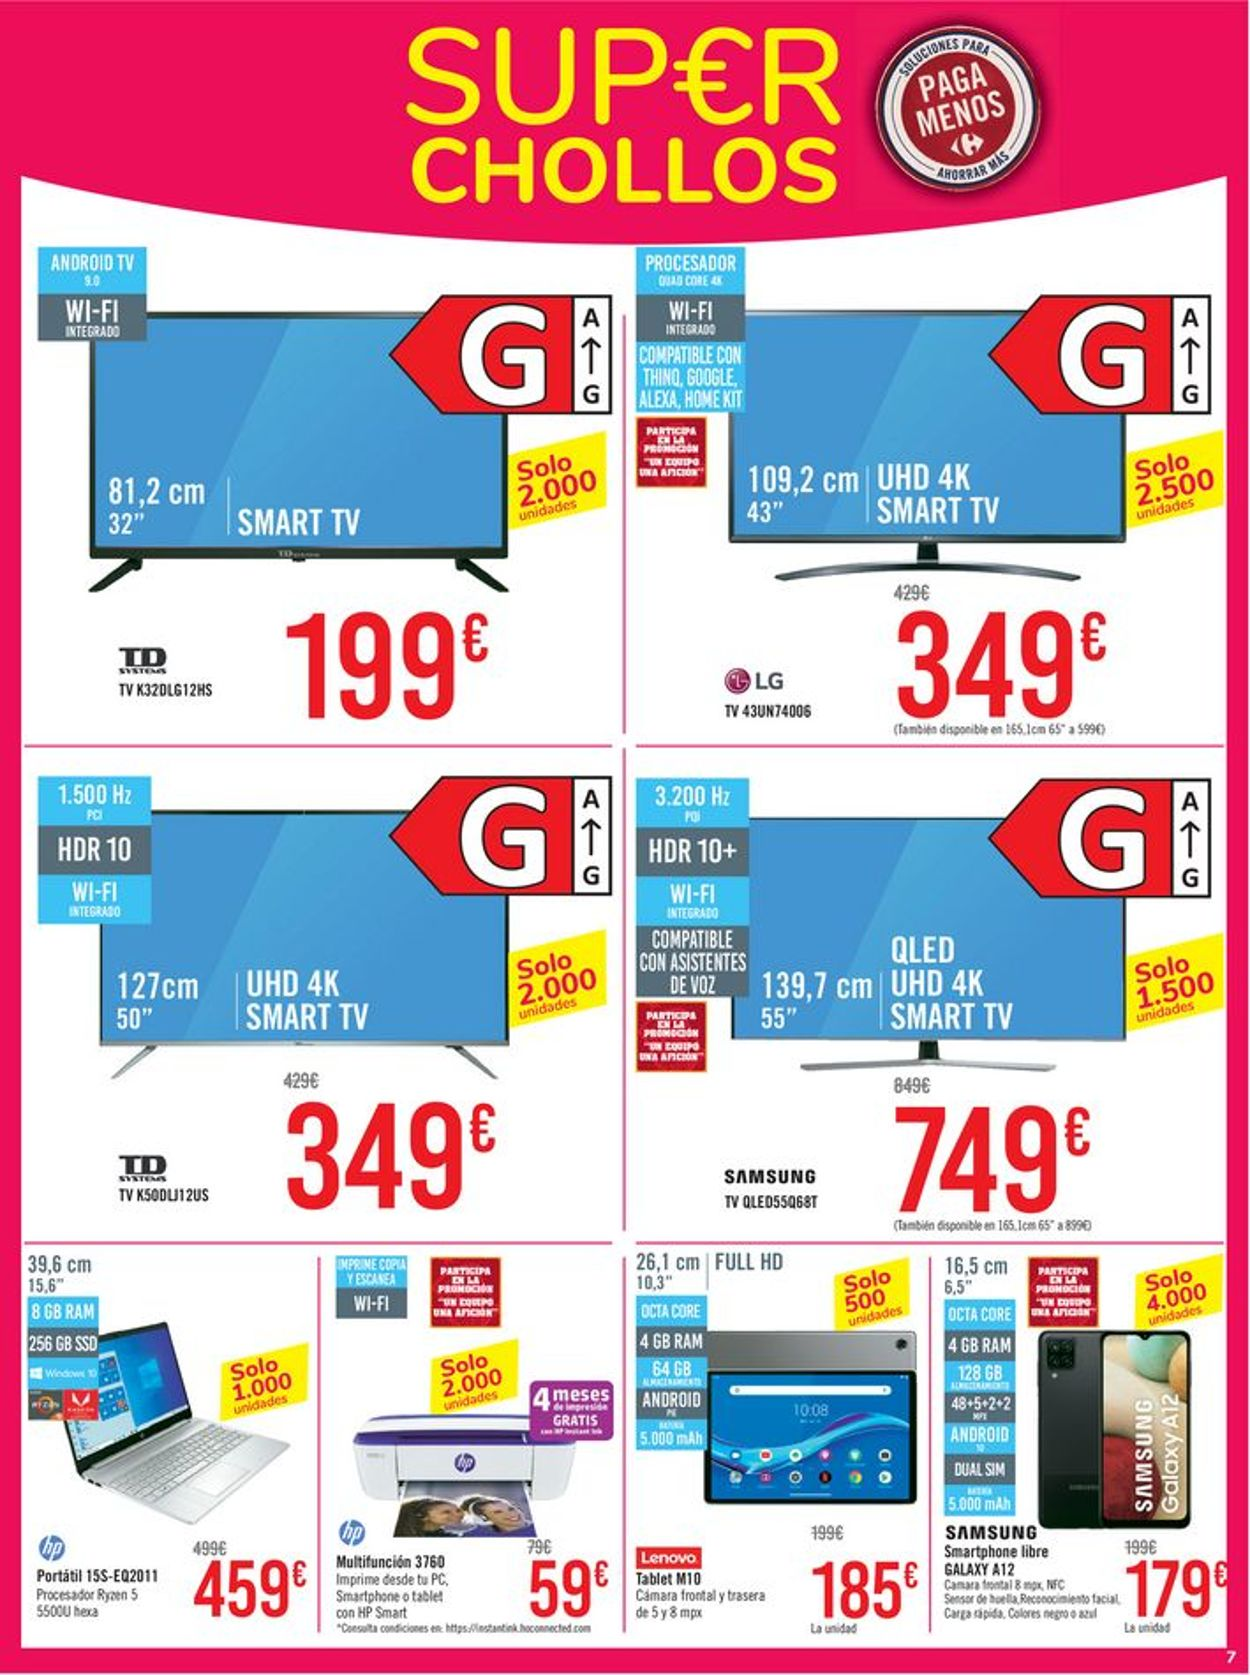 Carrefour Precios imbatibles para ayudarte Folleto - 18.05-24.05.2021 (Página 7)